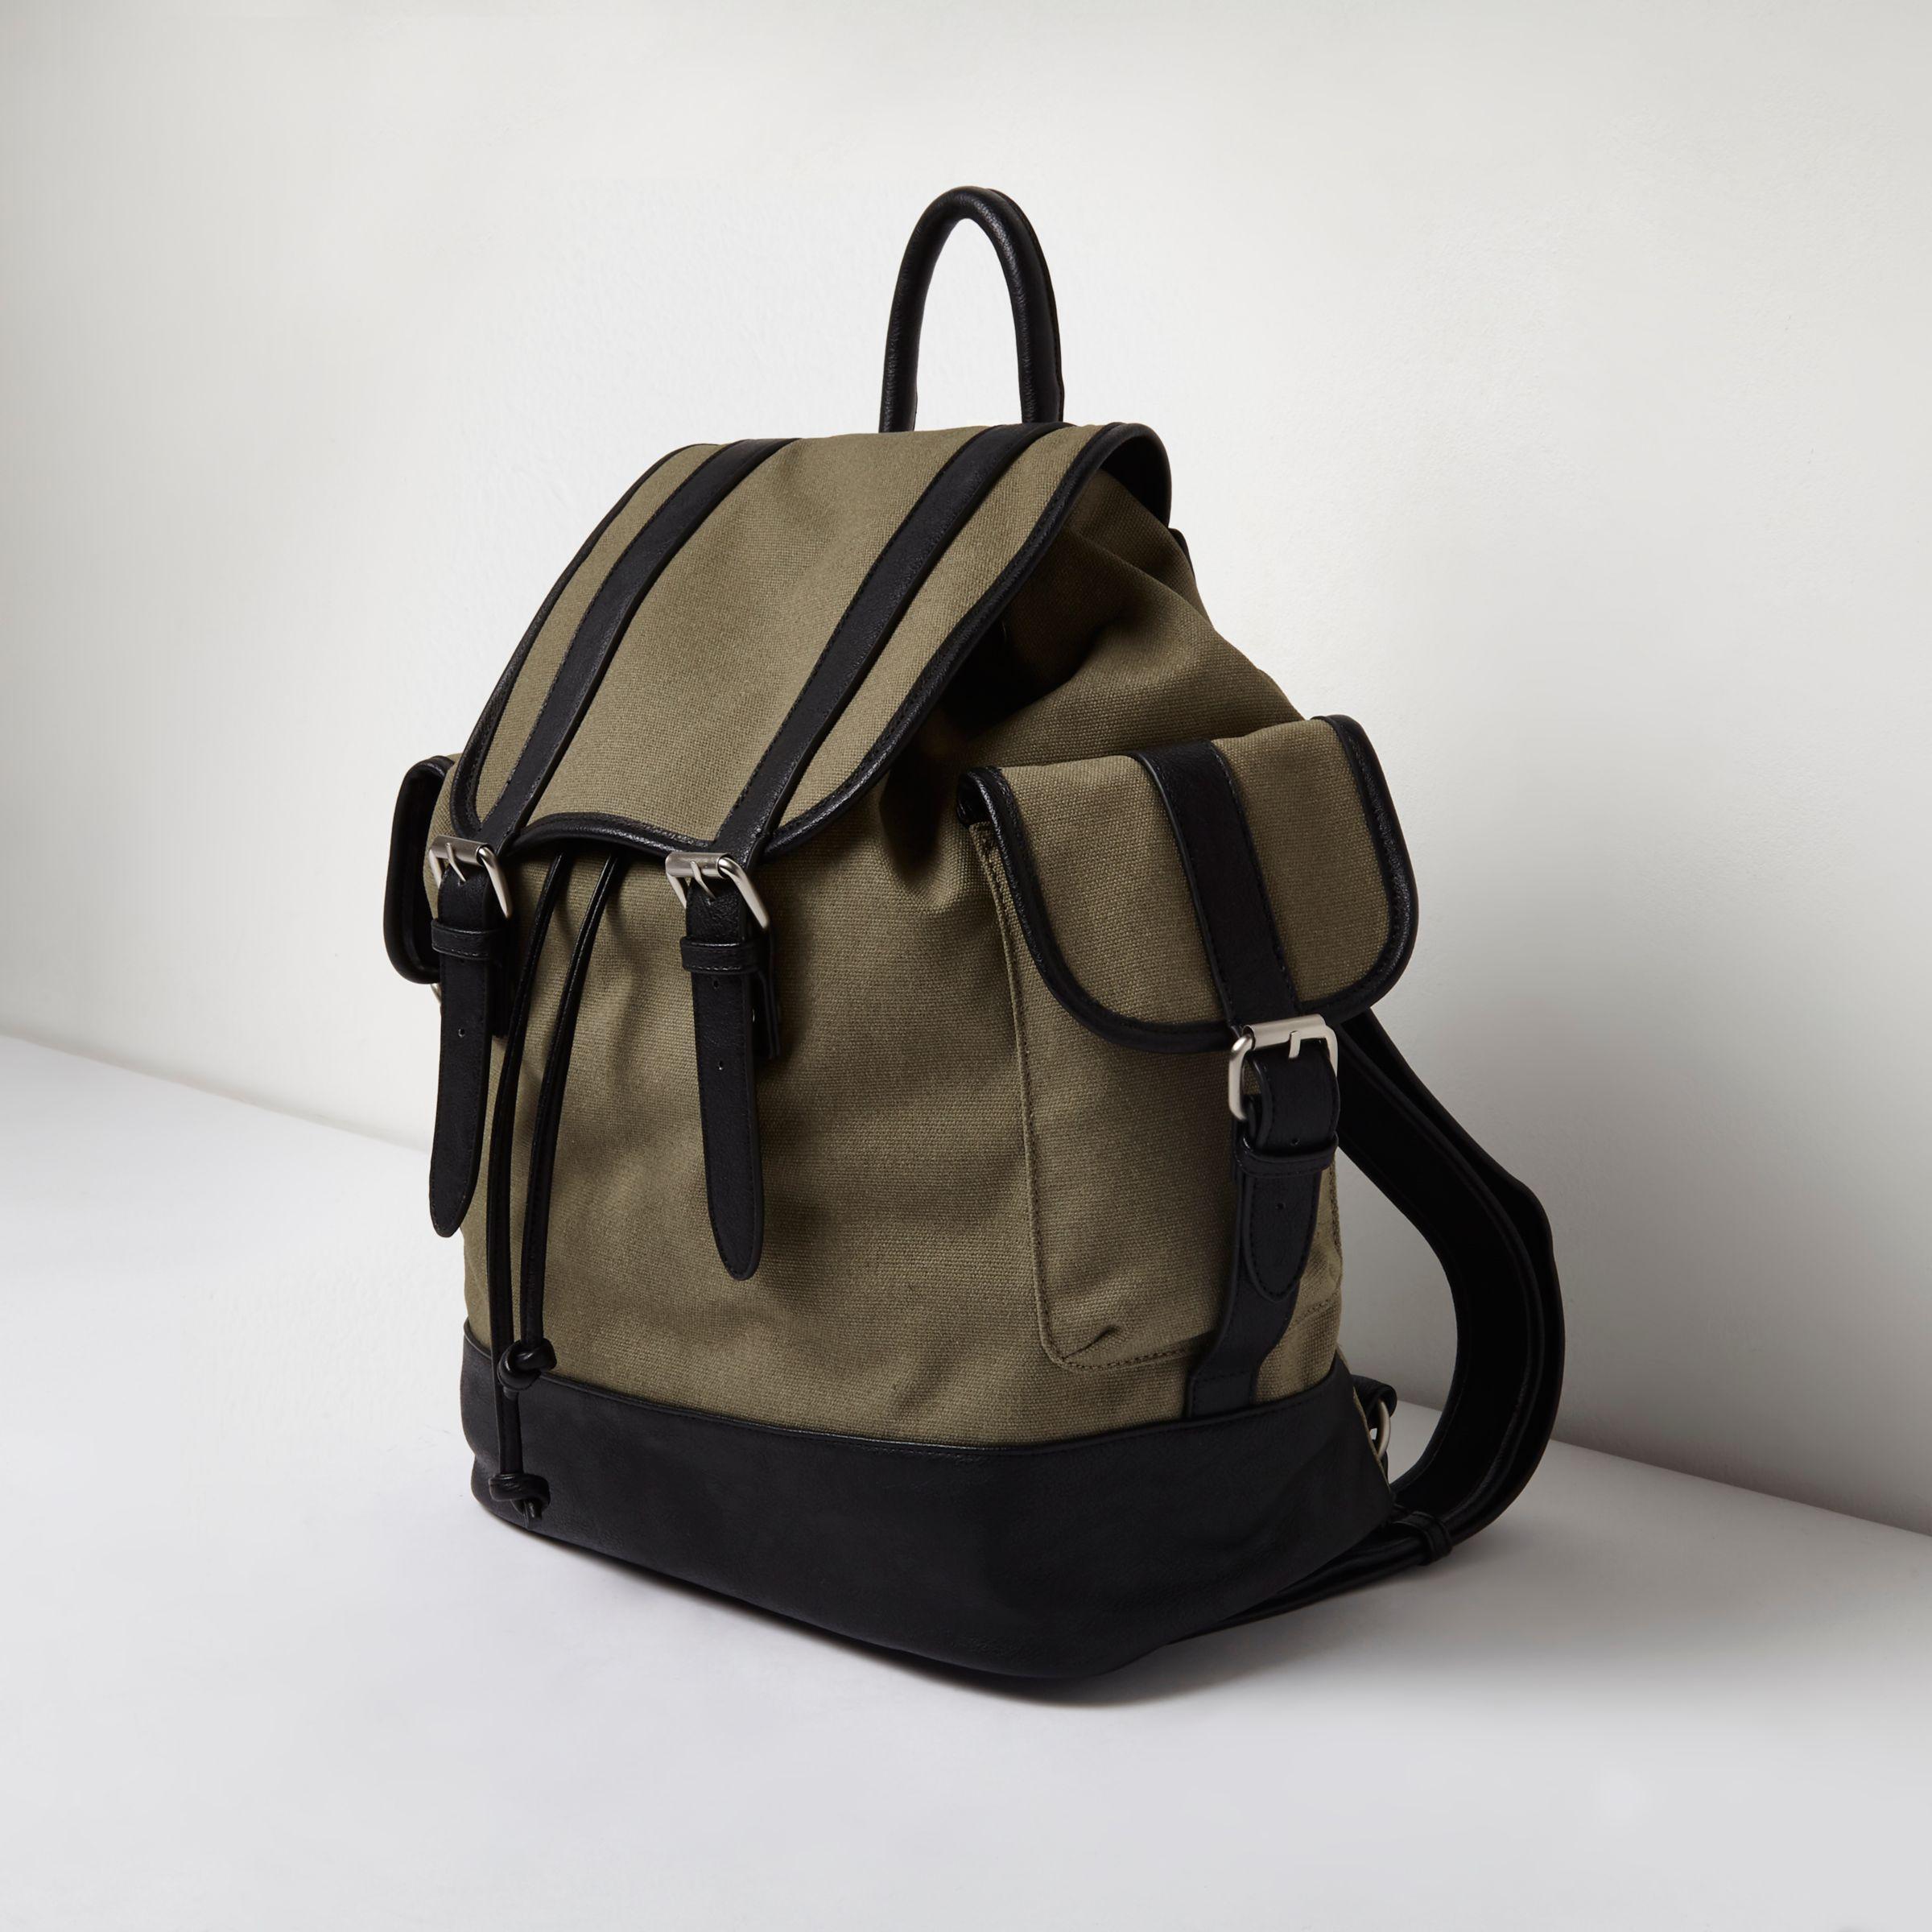 River Island Khaki Green Canvas Flap Top Backpack for Men